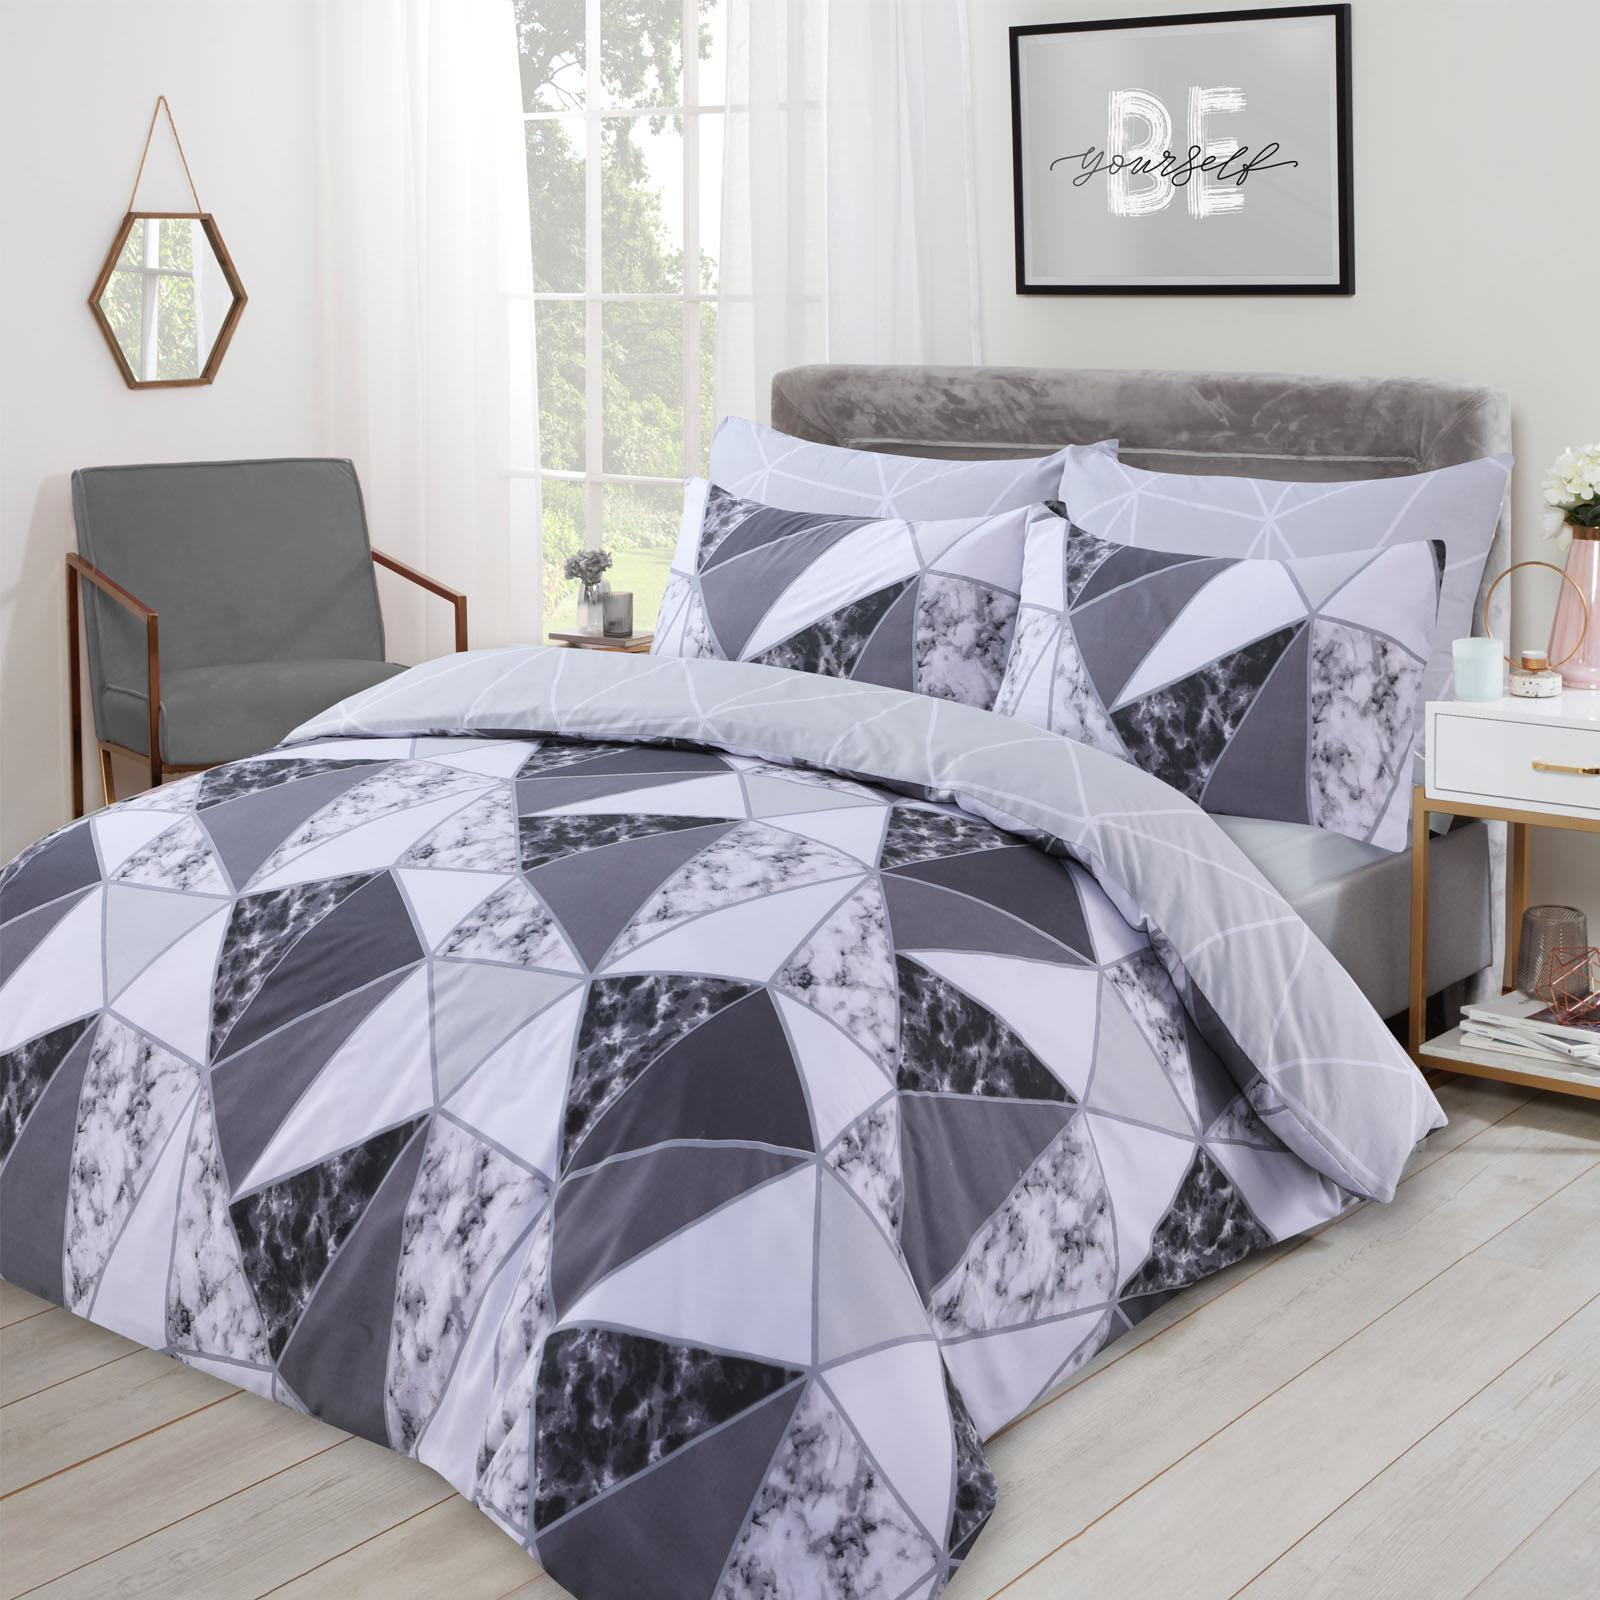 thumbnail 15 - Dreamscene Marble Geometric Duvet Cover with Pillowcase Bedding Set Grey Blush